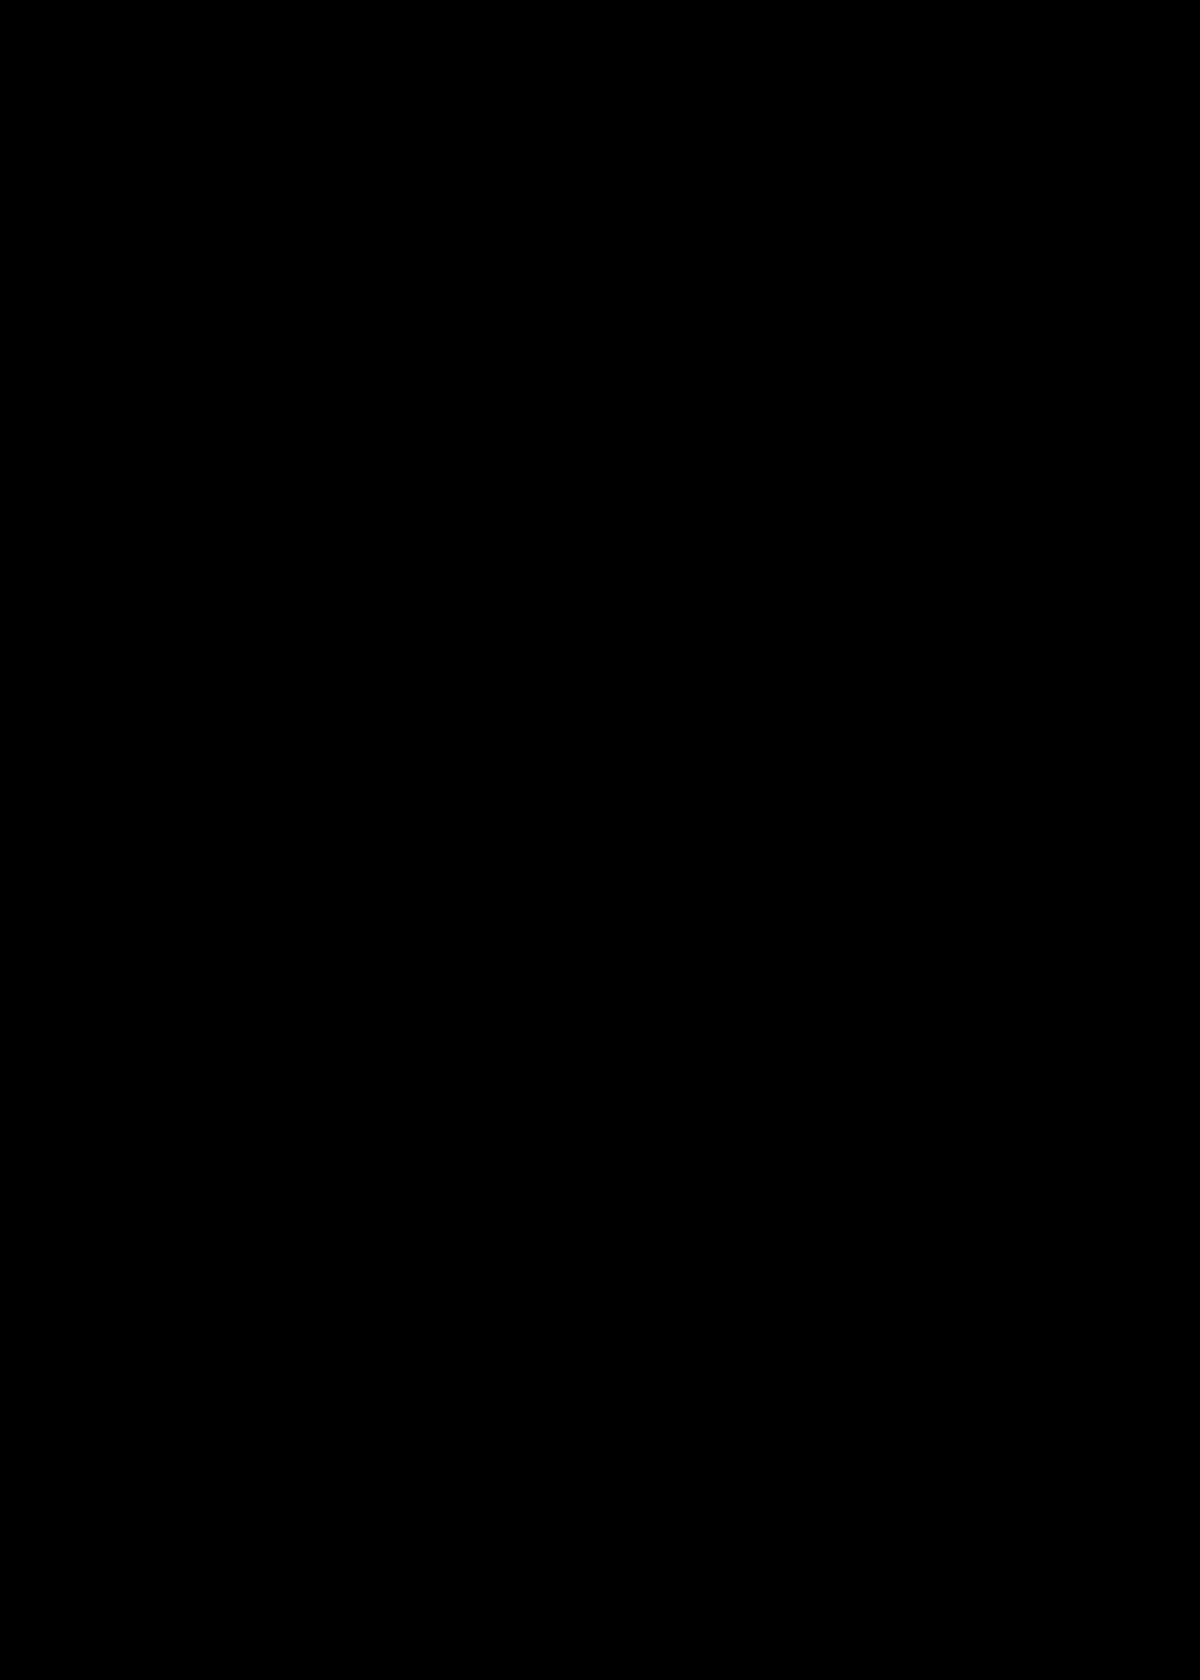 TypeCrit Feat. M. Majoor 50cm x 70xm